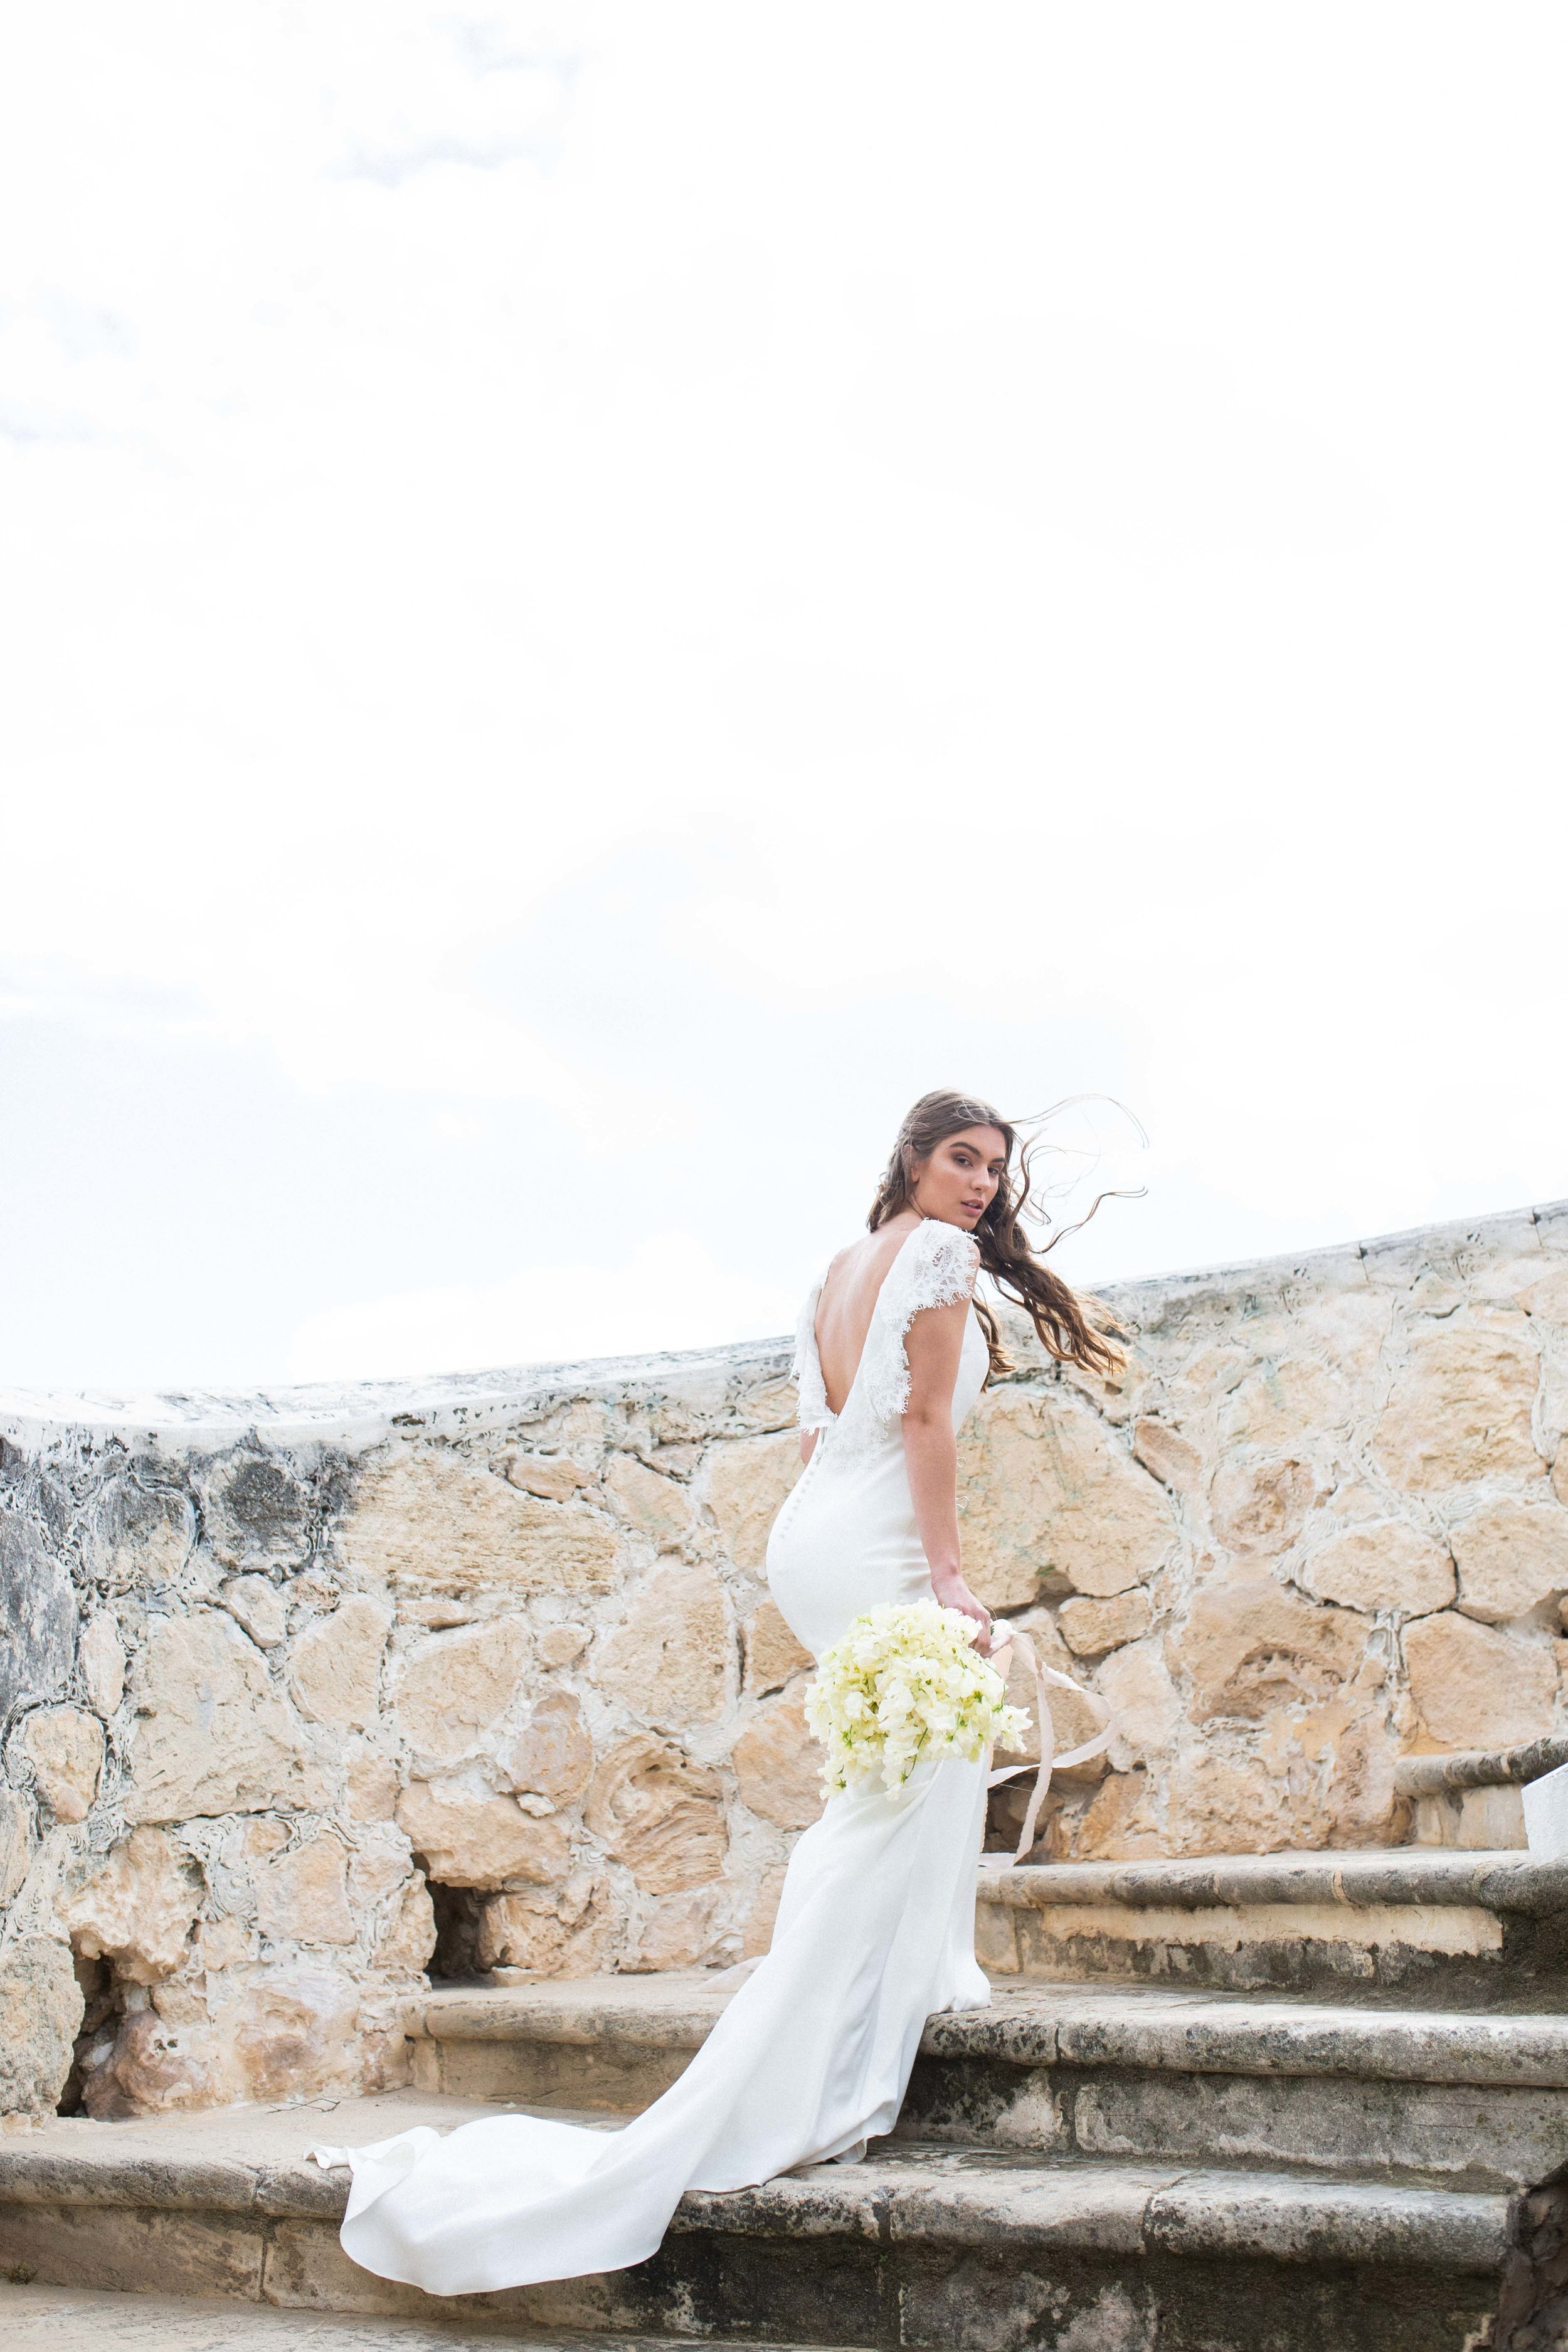 Fremantle Wedding Walk - Blue HQ, Perth Wedding Venue -  Tessa Kit Photography -JQ9A8992.jpg